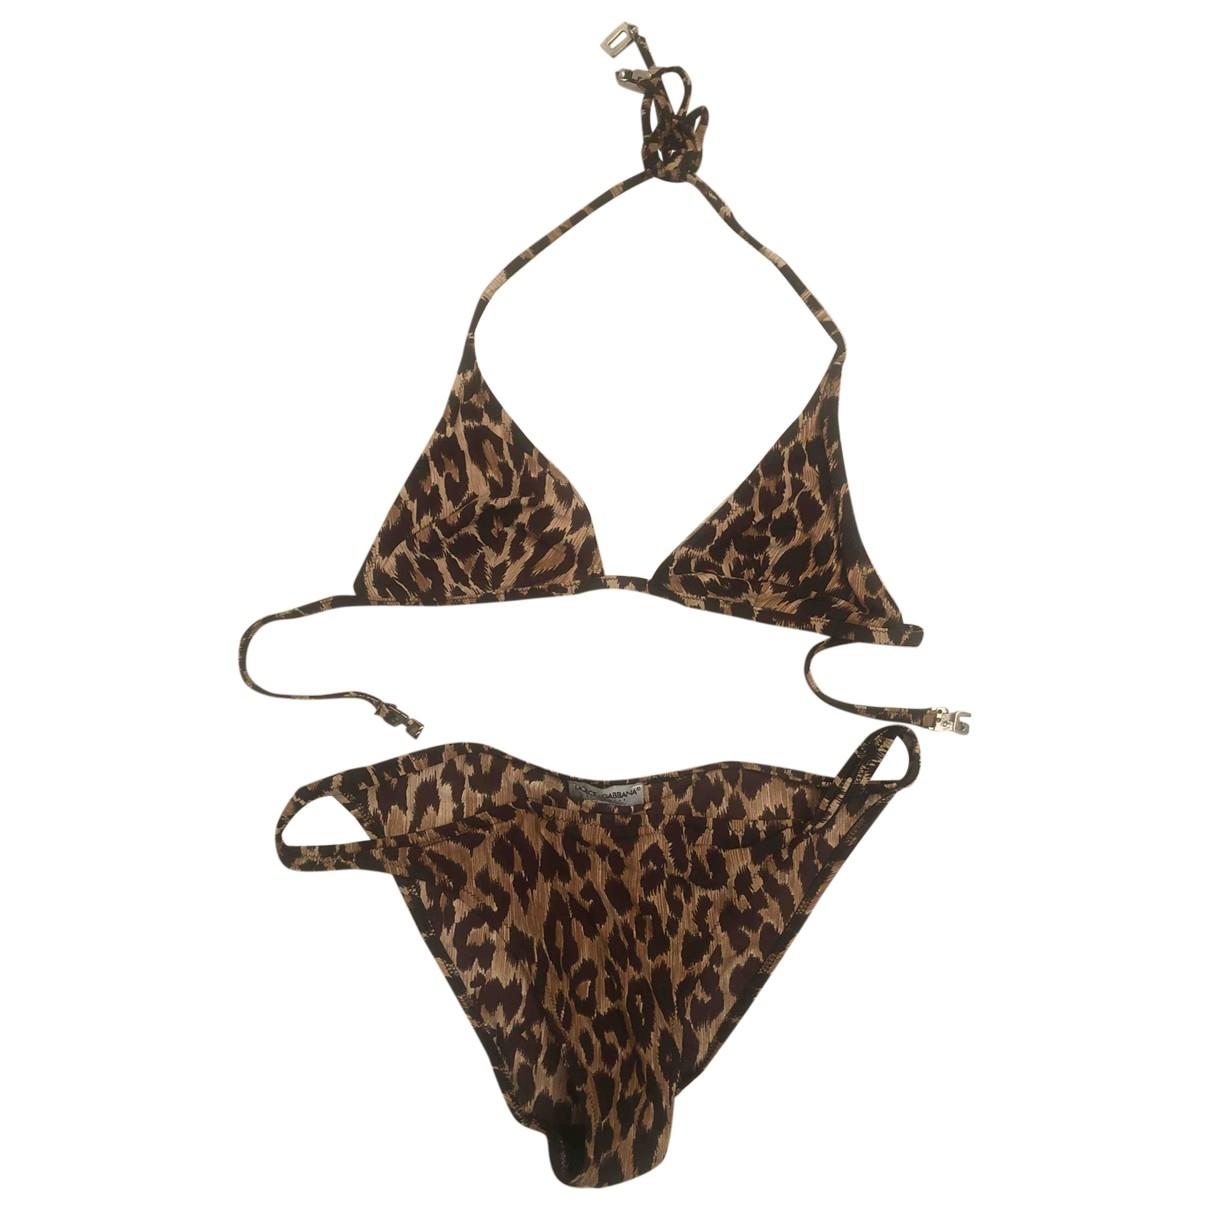 Dolce & Gabbana \N Multicolour Cotton - elasthane Swimwear for Women 40 IT